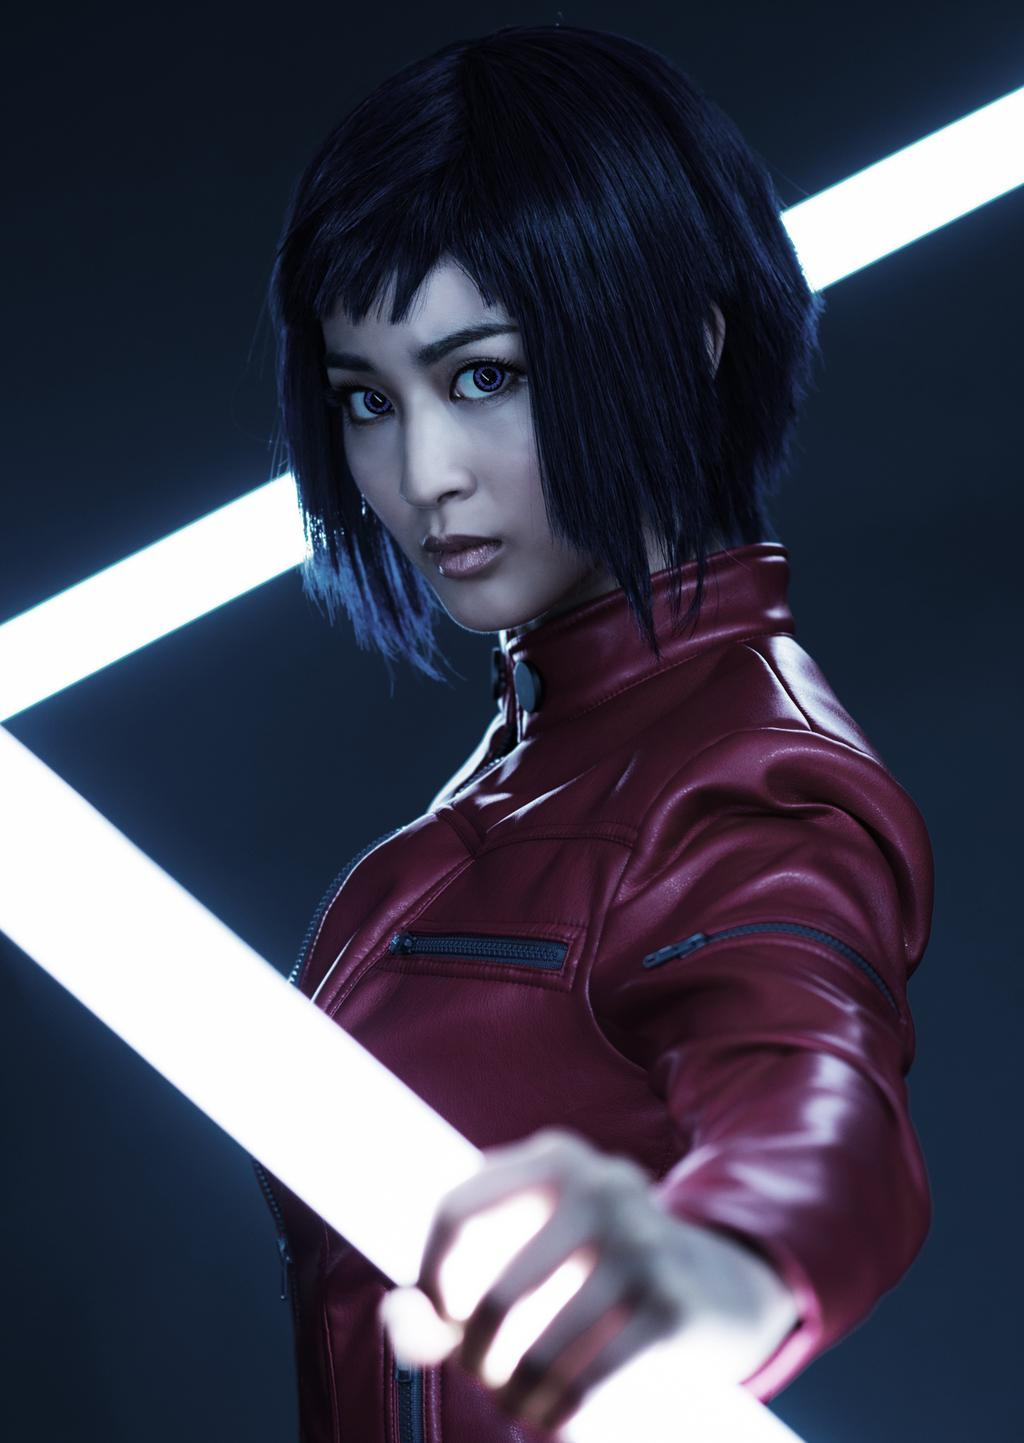 Motoko Kusanagi joué par Kaede Aono